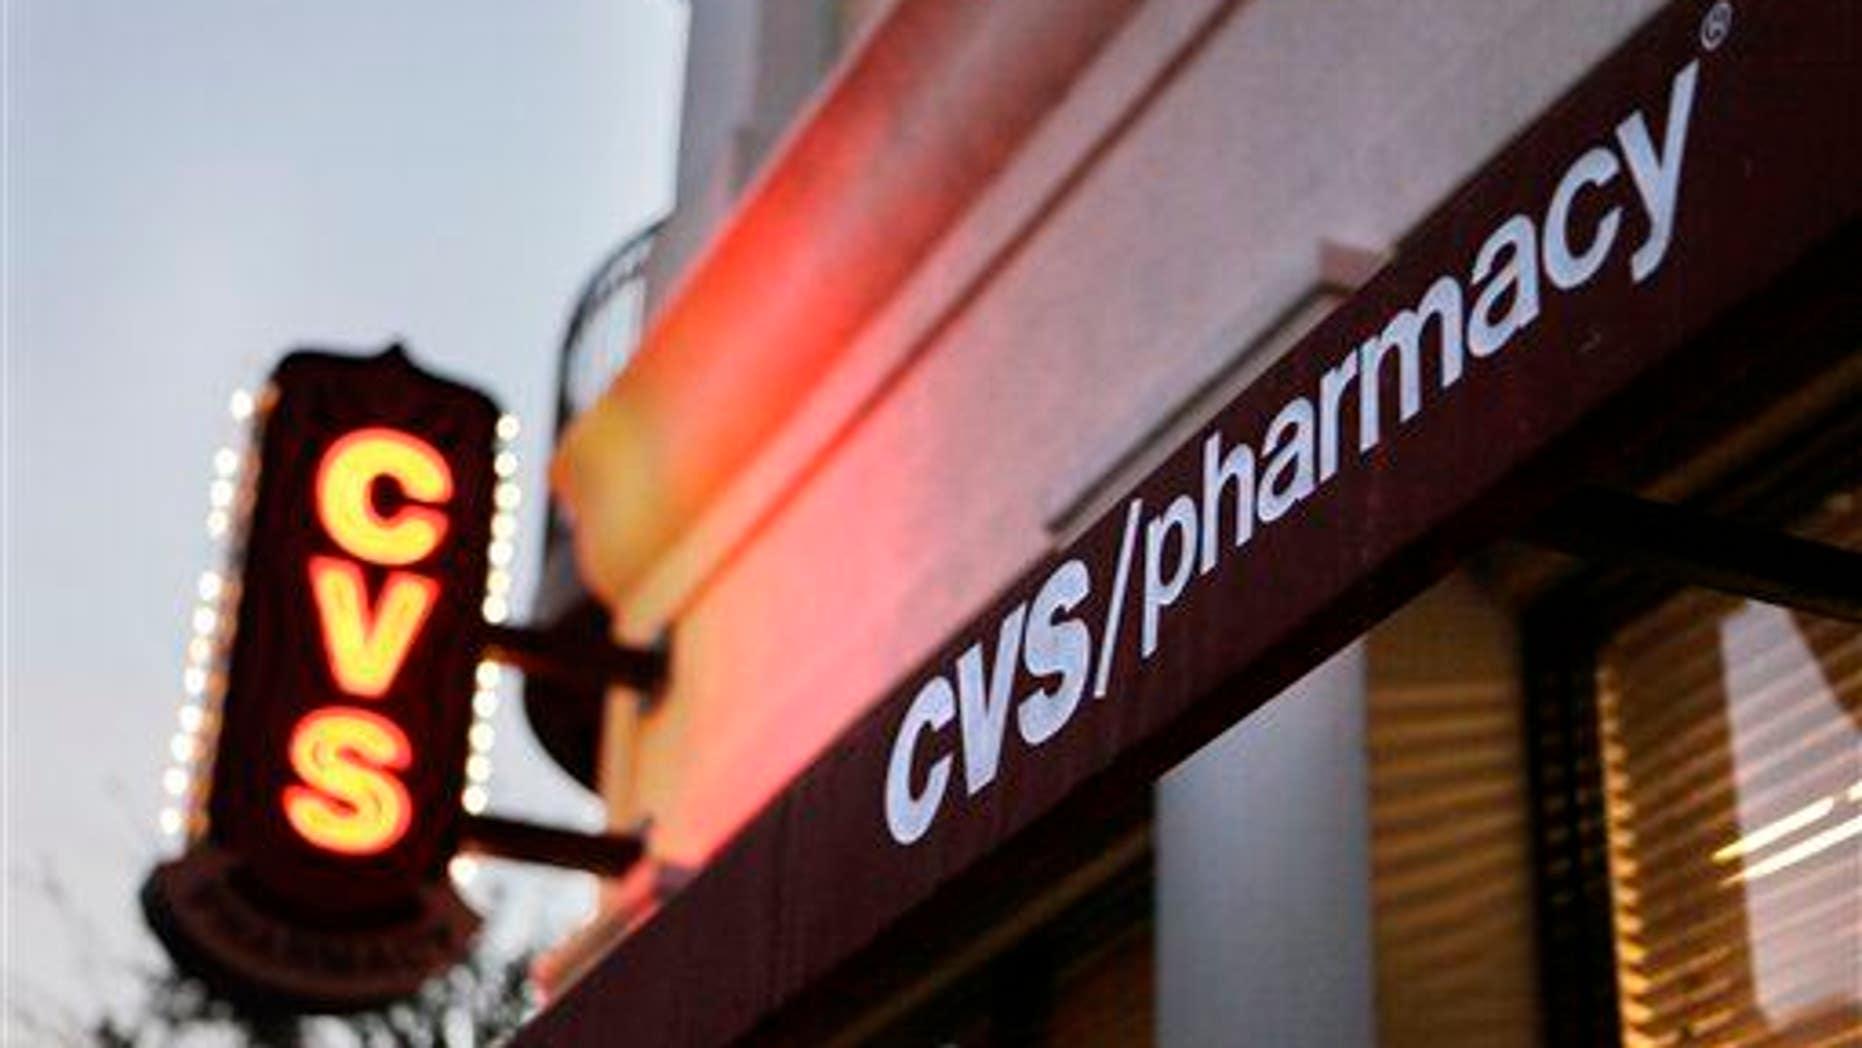 A CVS pharmacy is seen in Orlando, Fla., on Feb. 2, 2011.